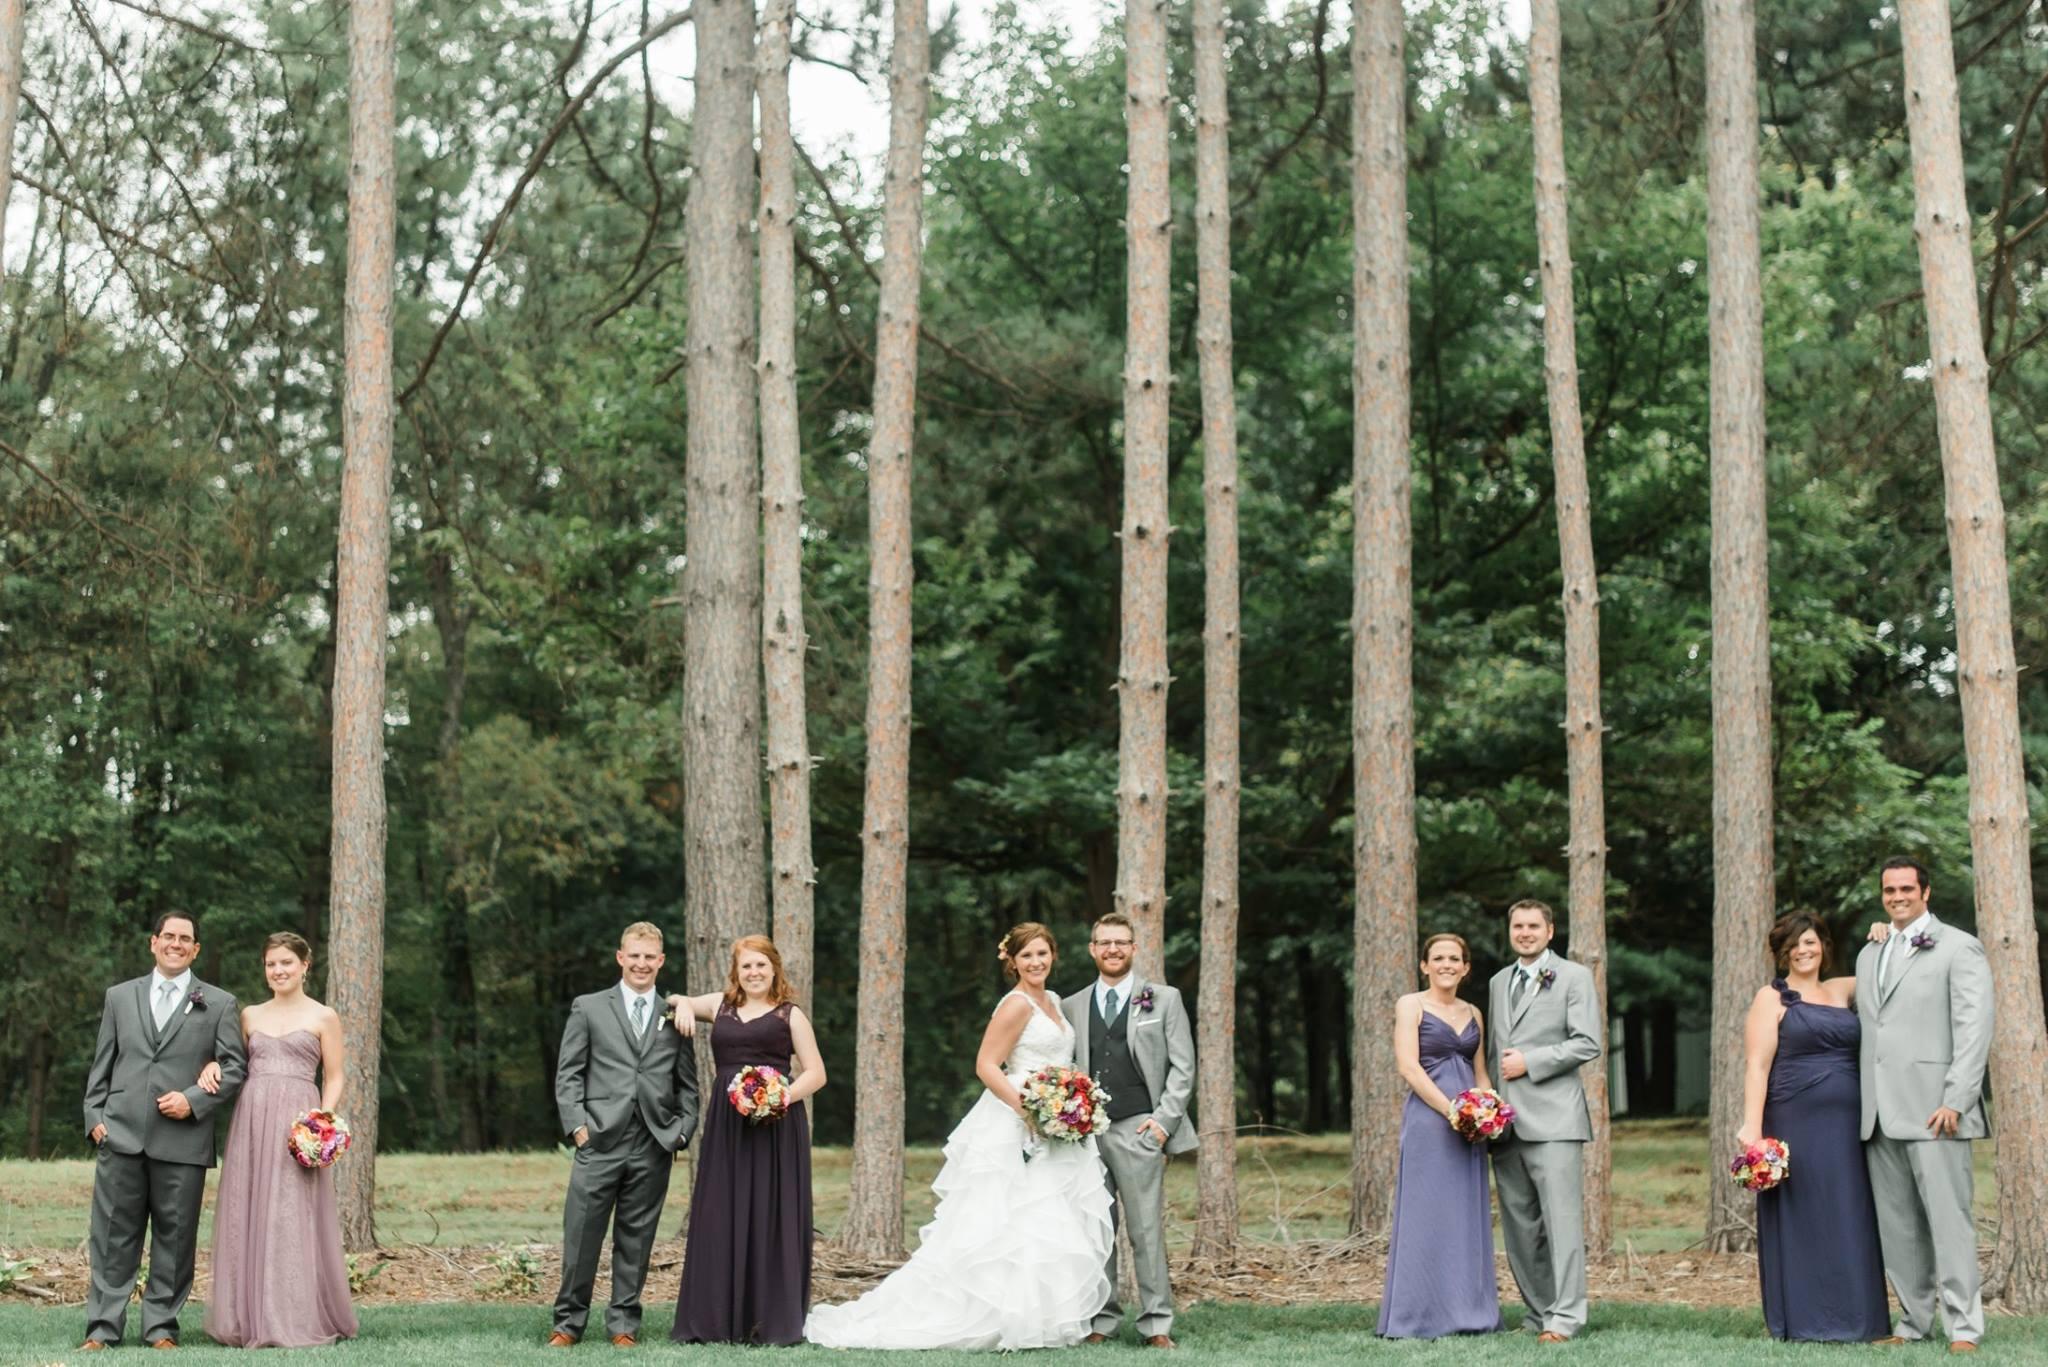 pennsylvania-backyard-wedding-love-diy-bohemian-romantic-colorful-0017.jpg